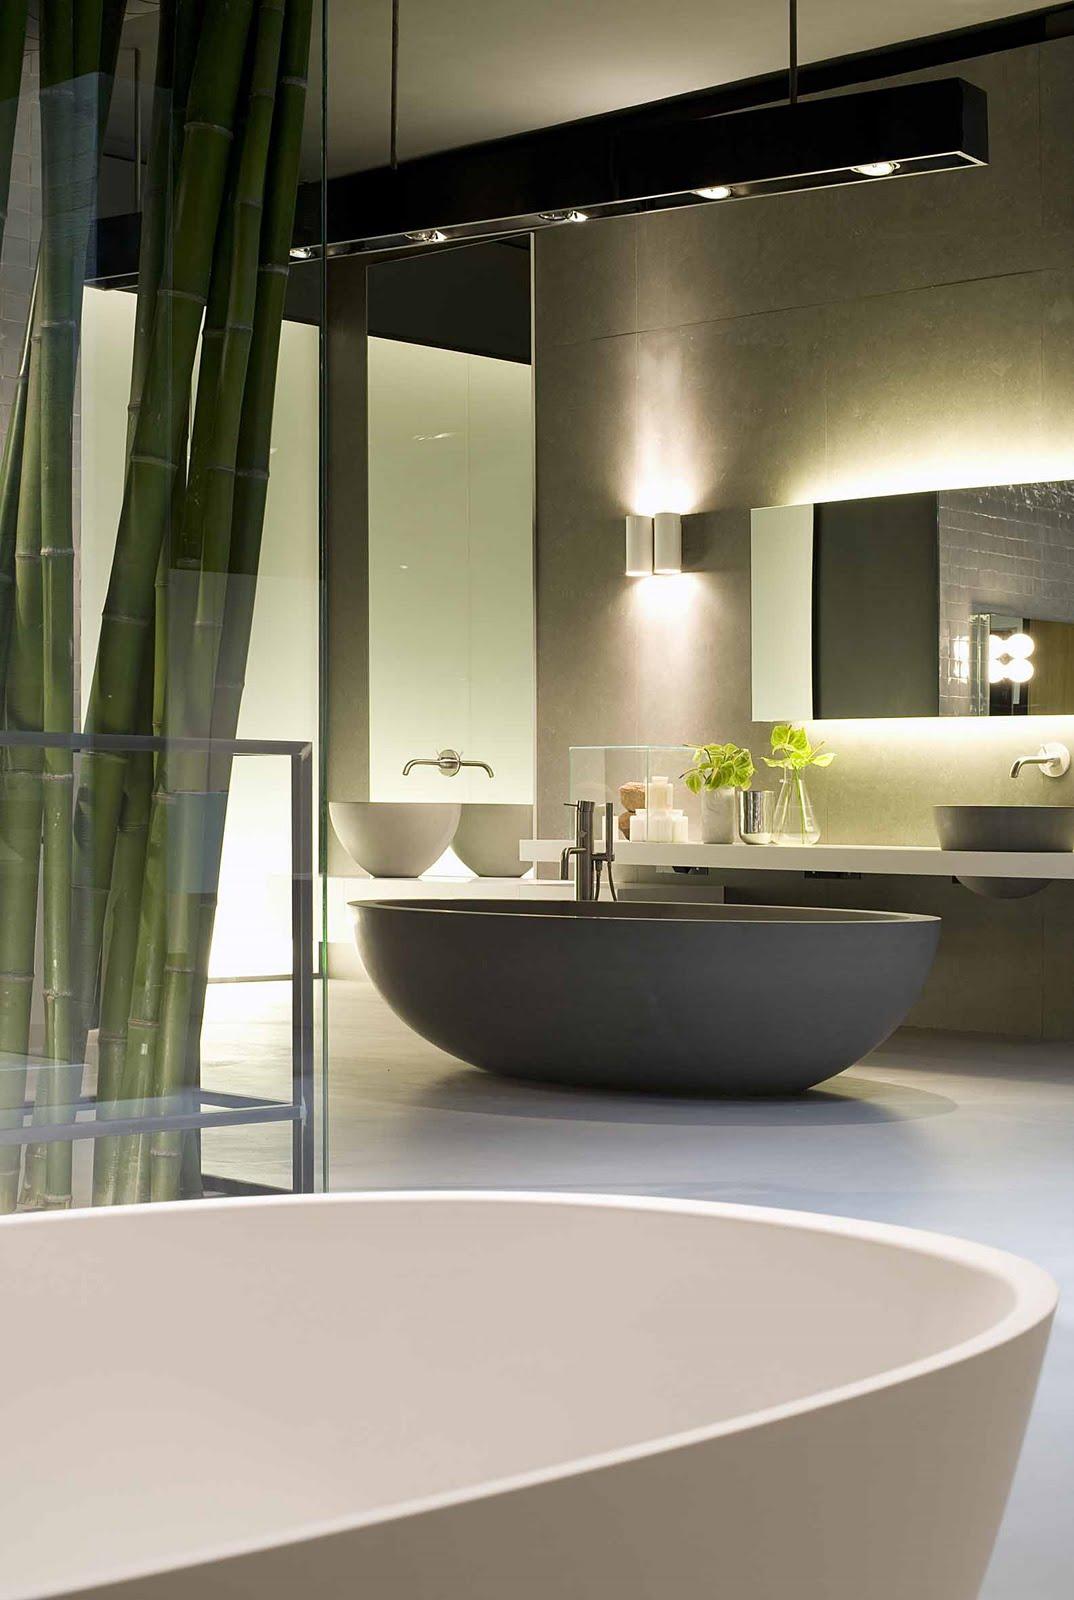 boffi neuheiten 2012 pdf boffi k chen kitchenology 1. Black Bedroom Furniture Sets. Home Design Ideas